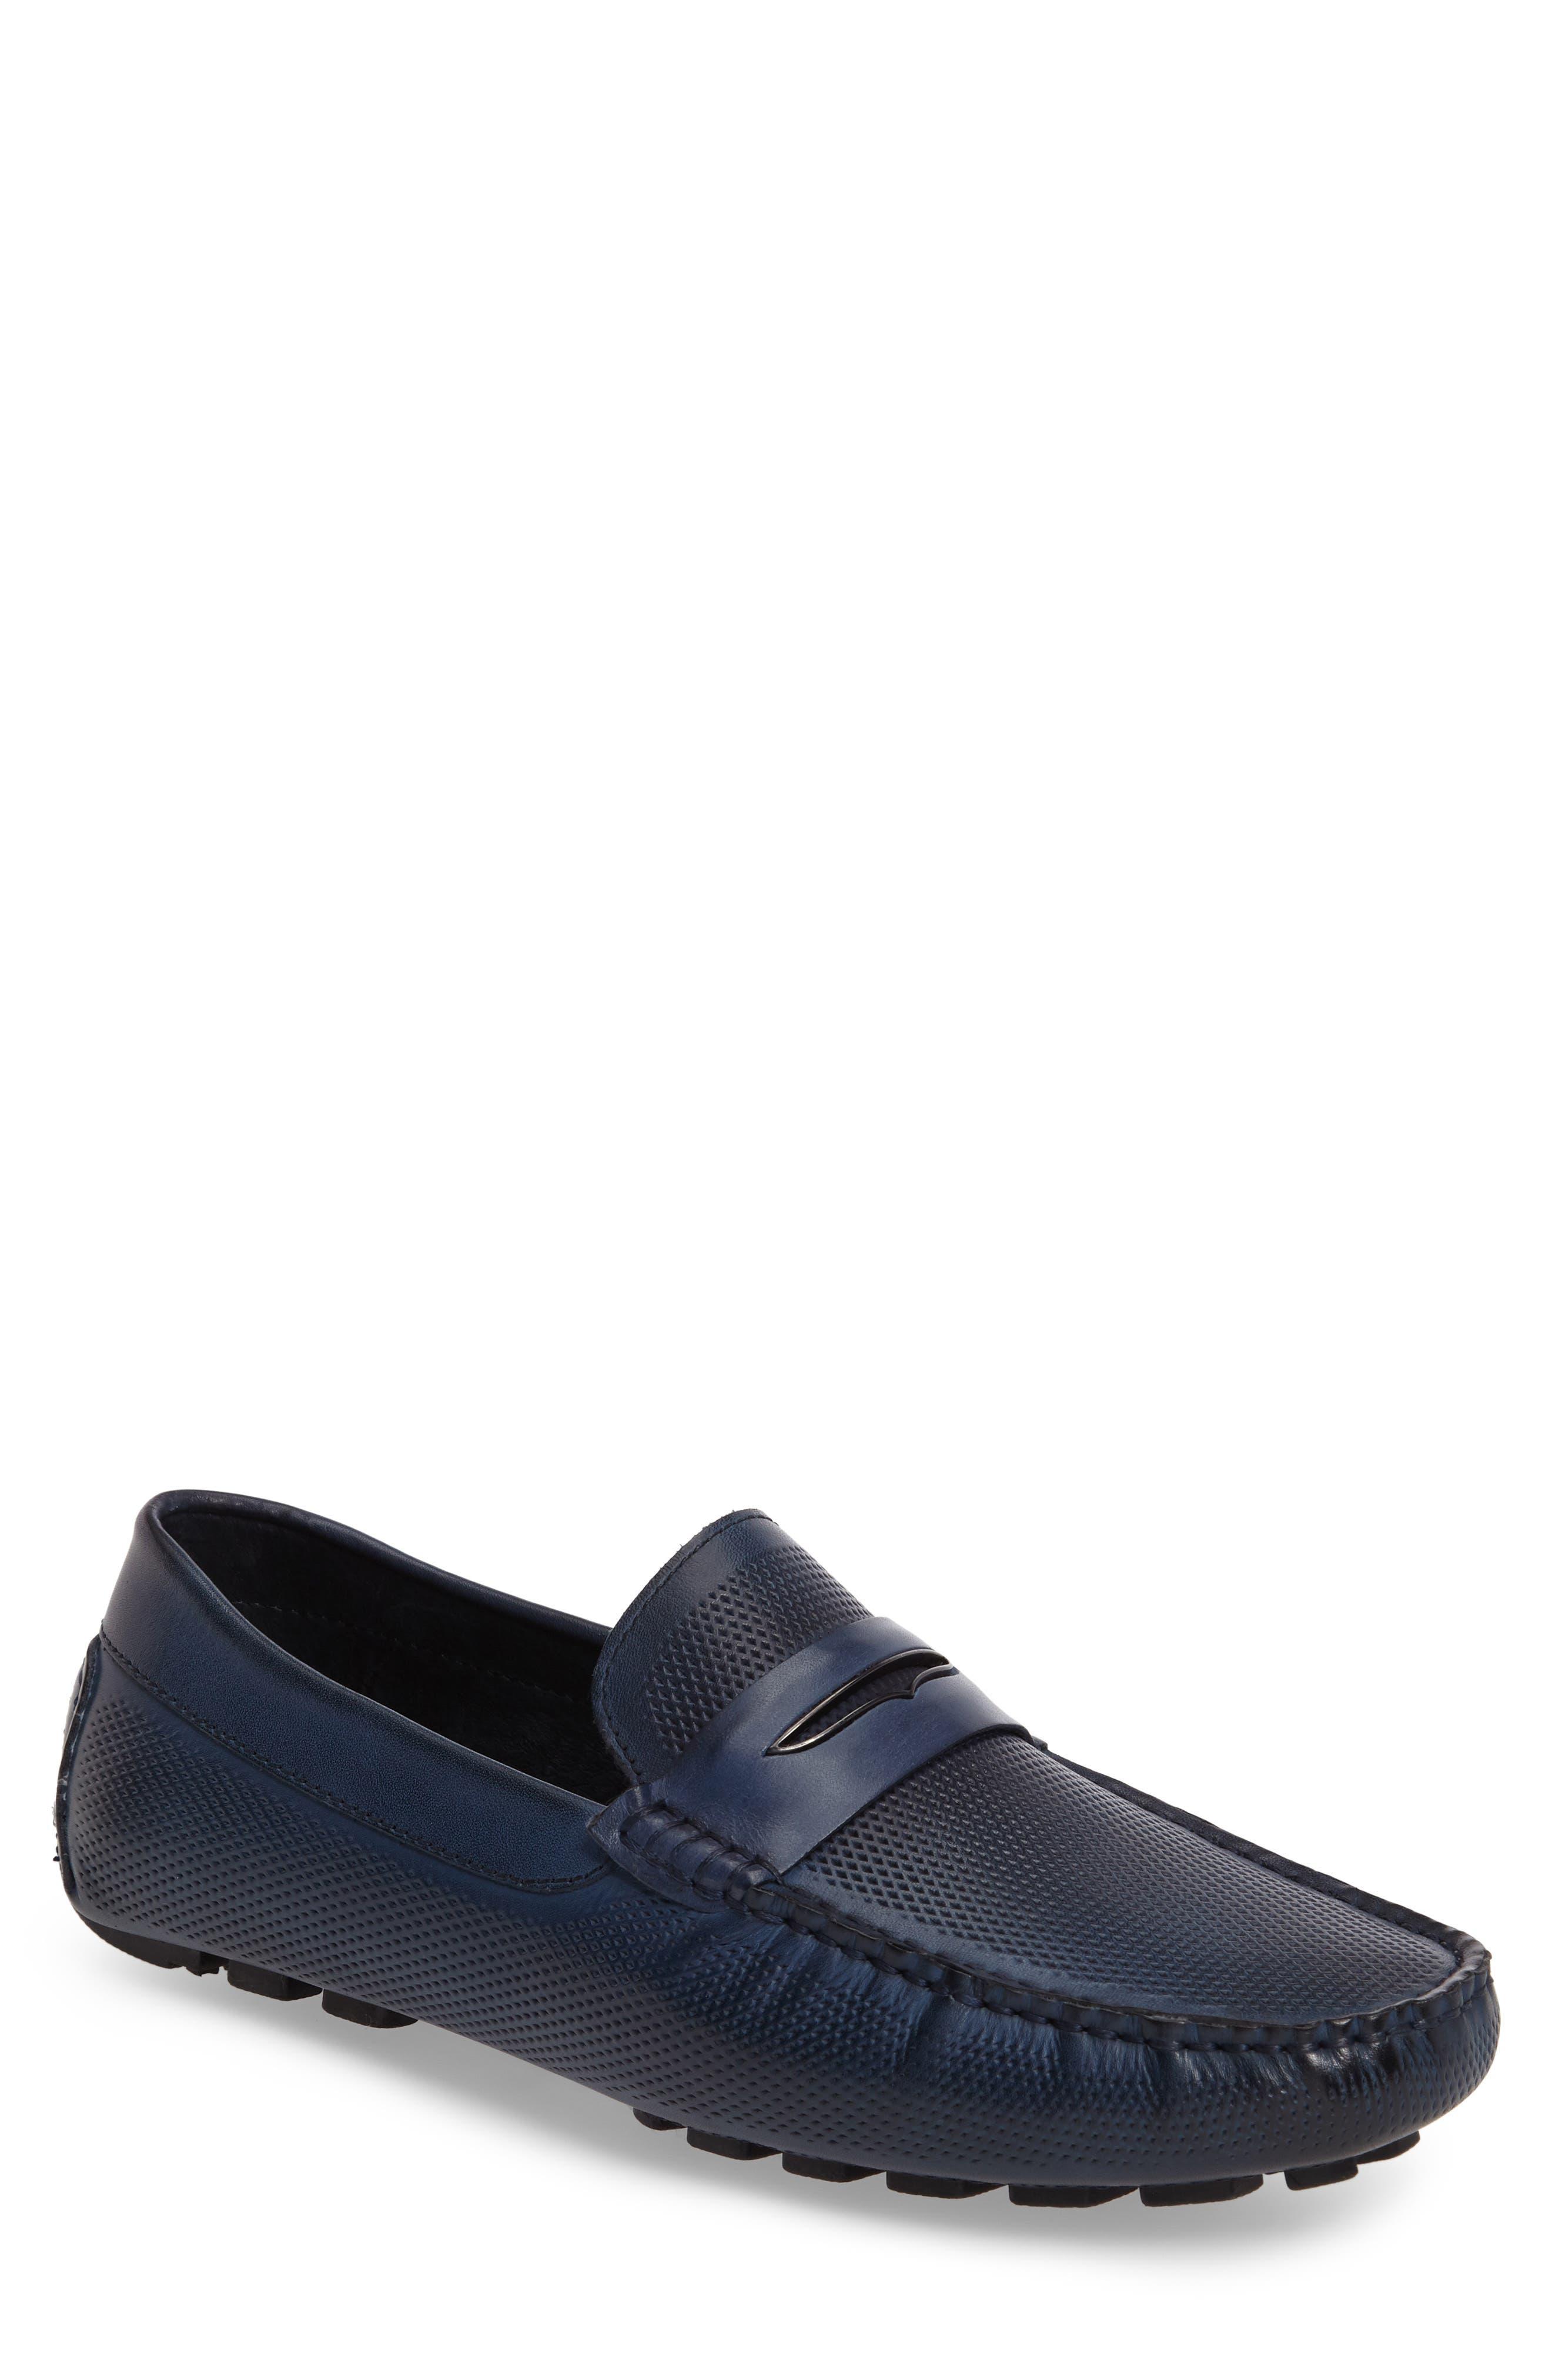 Alternate Image 1 Selected - Zanzara Mondrian Driving Shoe (Men)